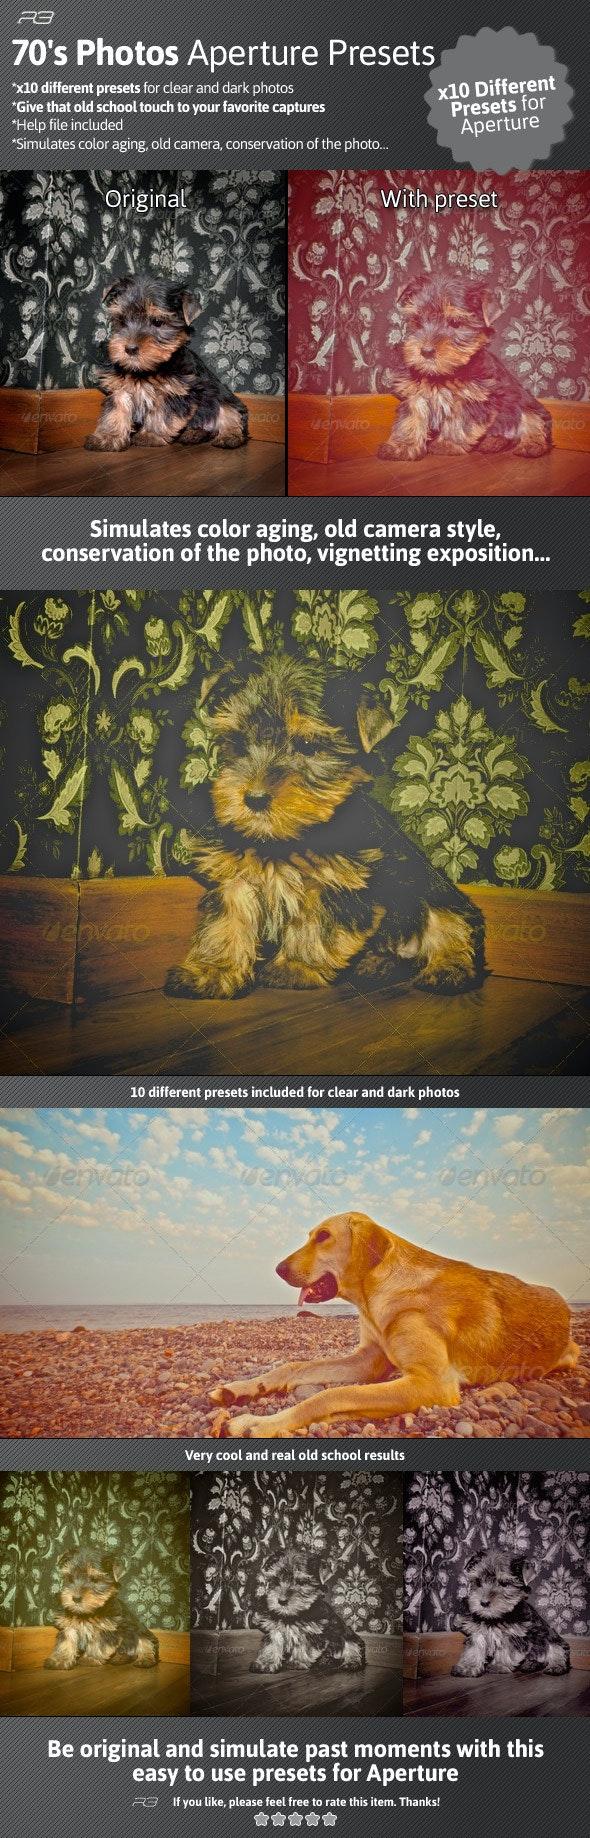 70's Photos Aperture Presets - Aperture Presets Add-ons